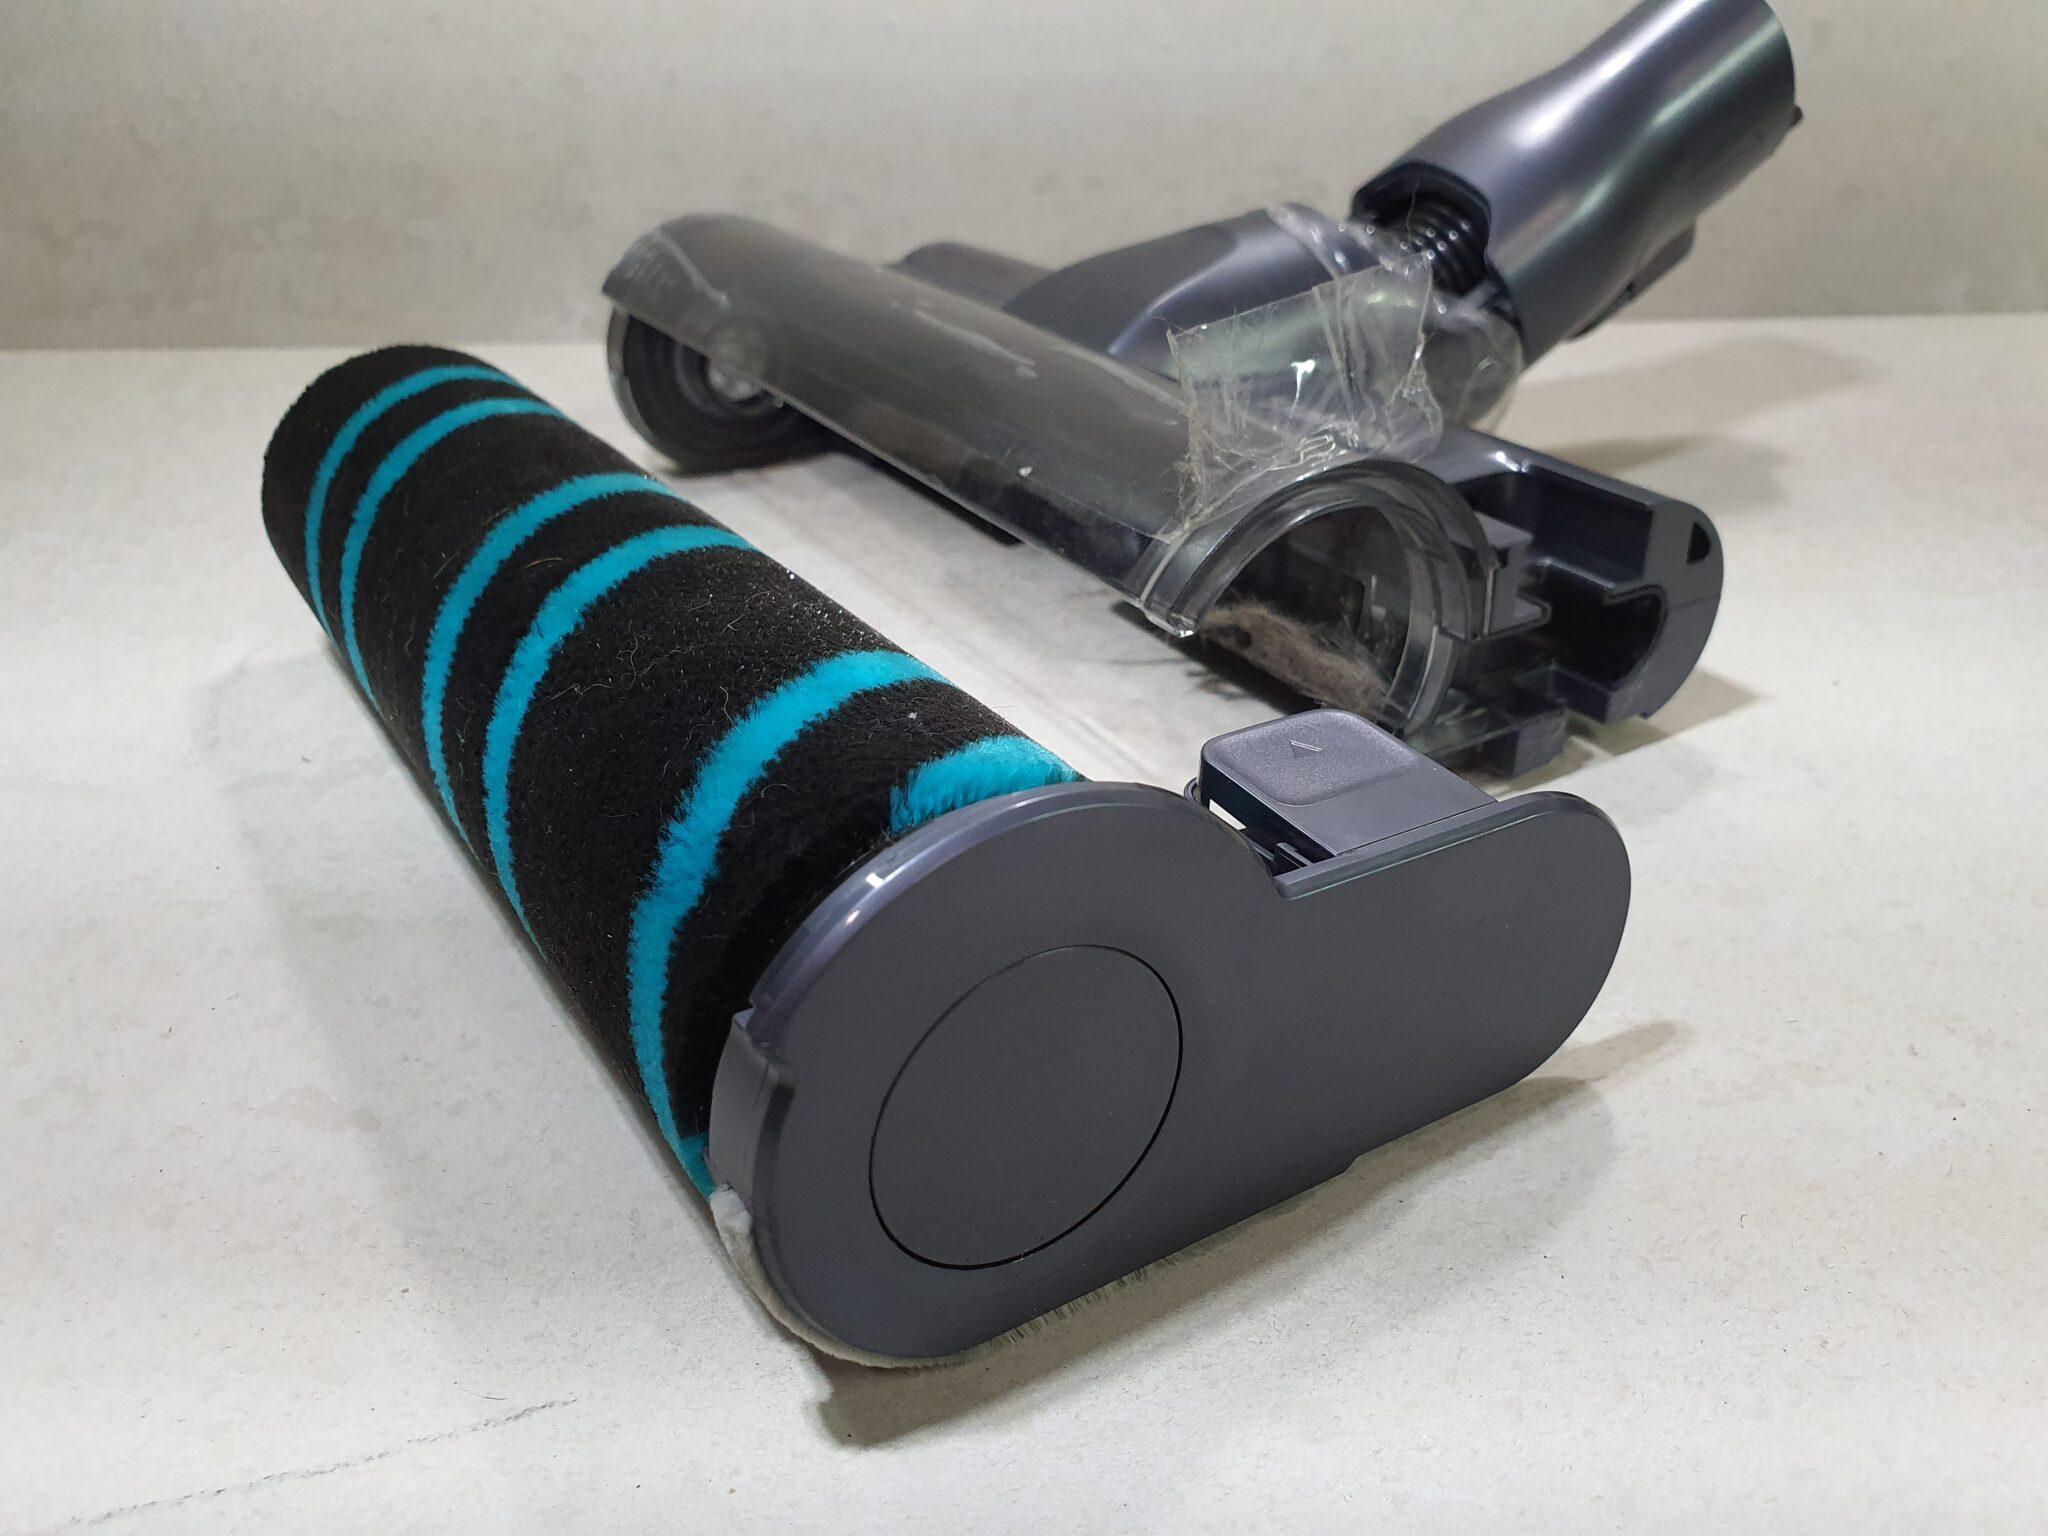 POWERstick Jet extendable brush